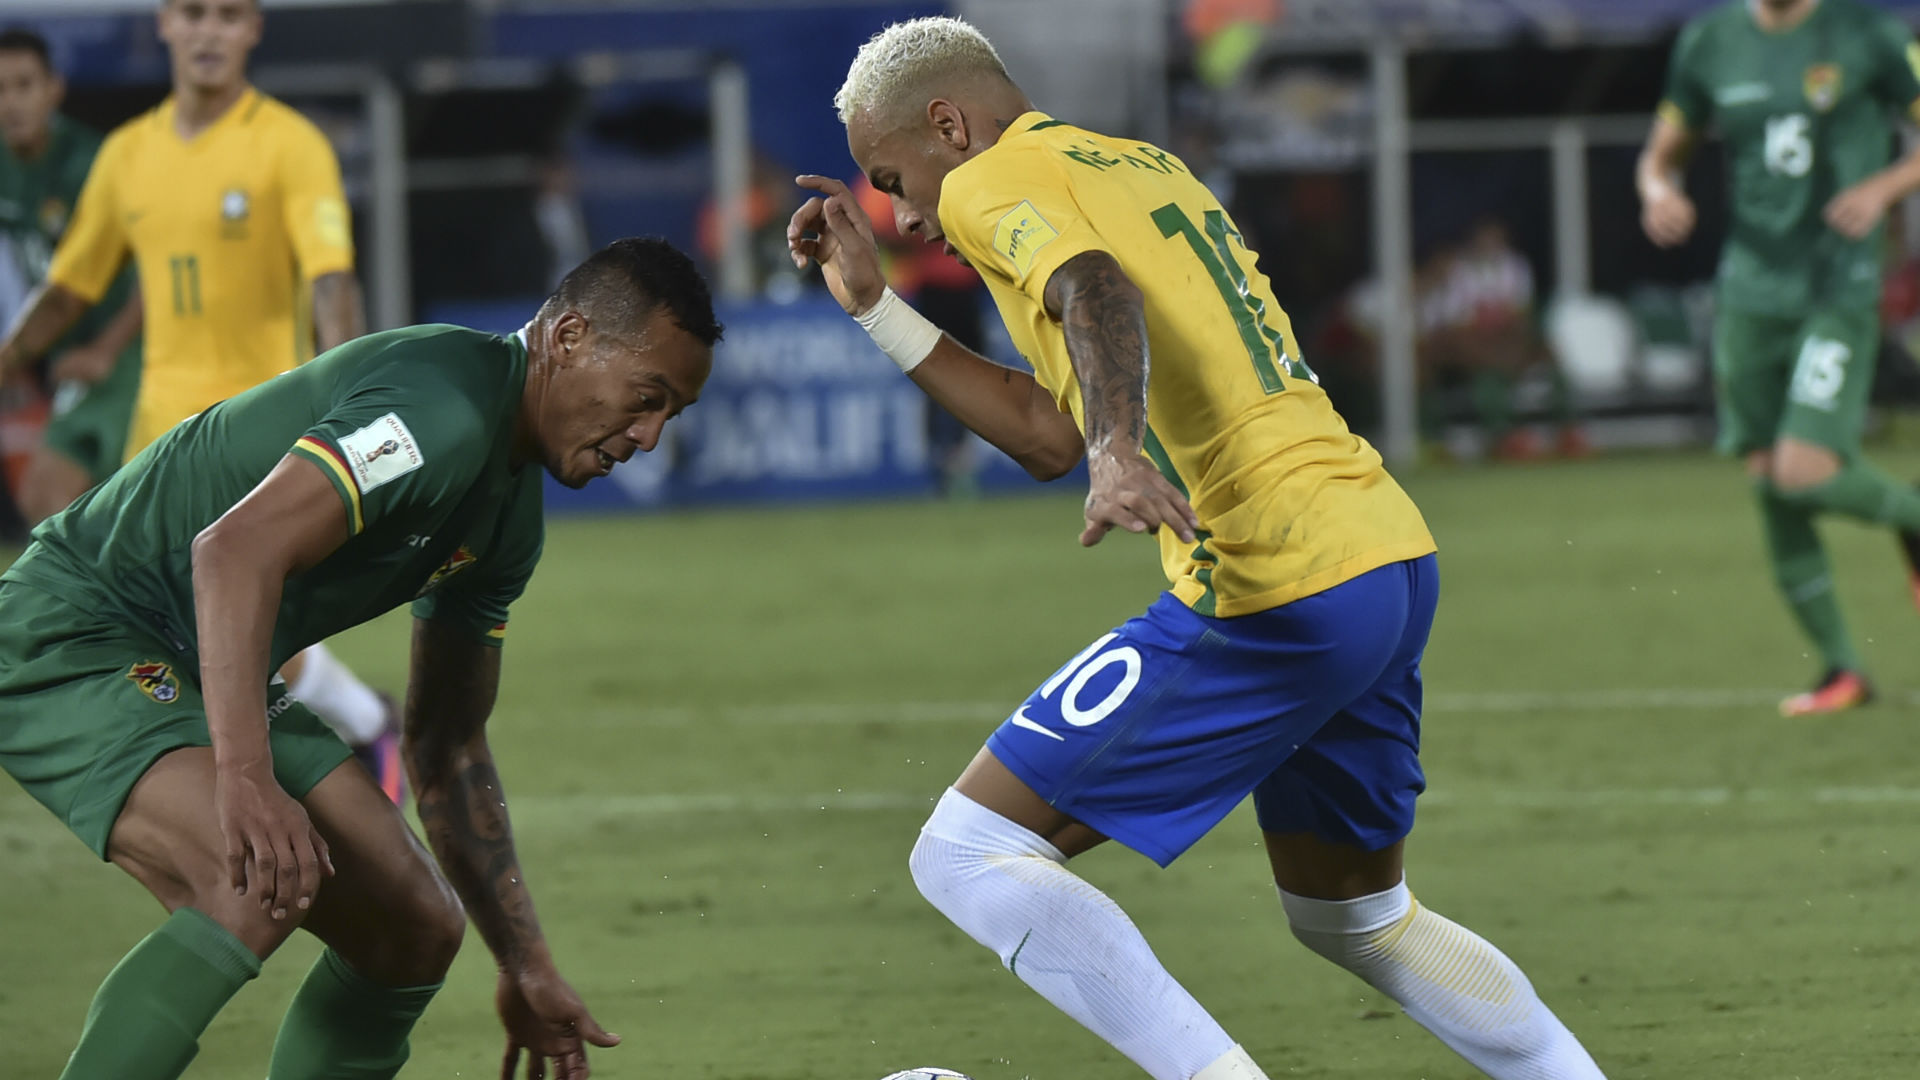 Neymar Brasil vs Bolivia Eliminatórias 2018 07 10 2016